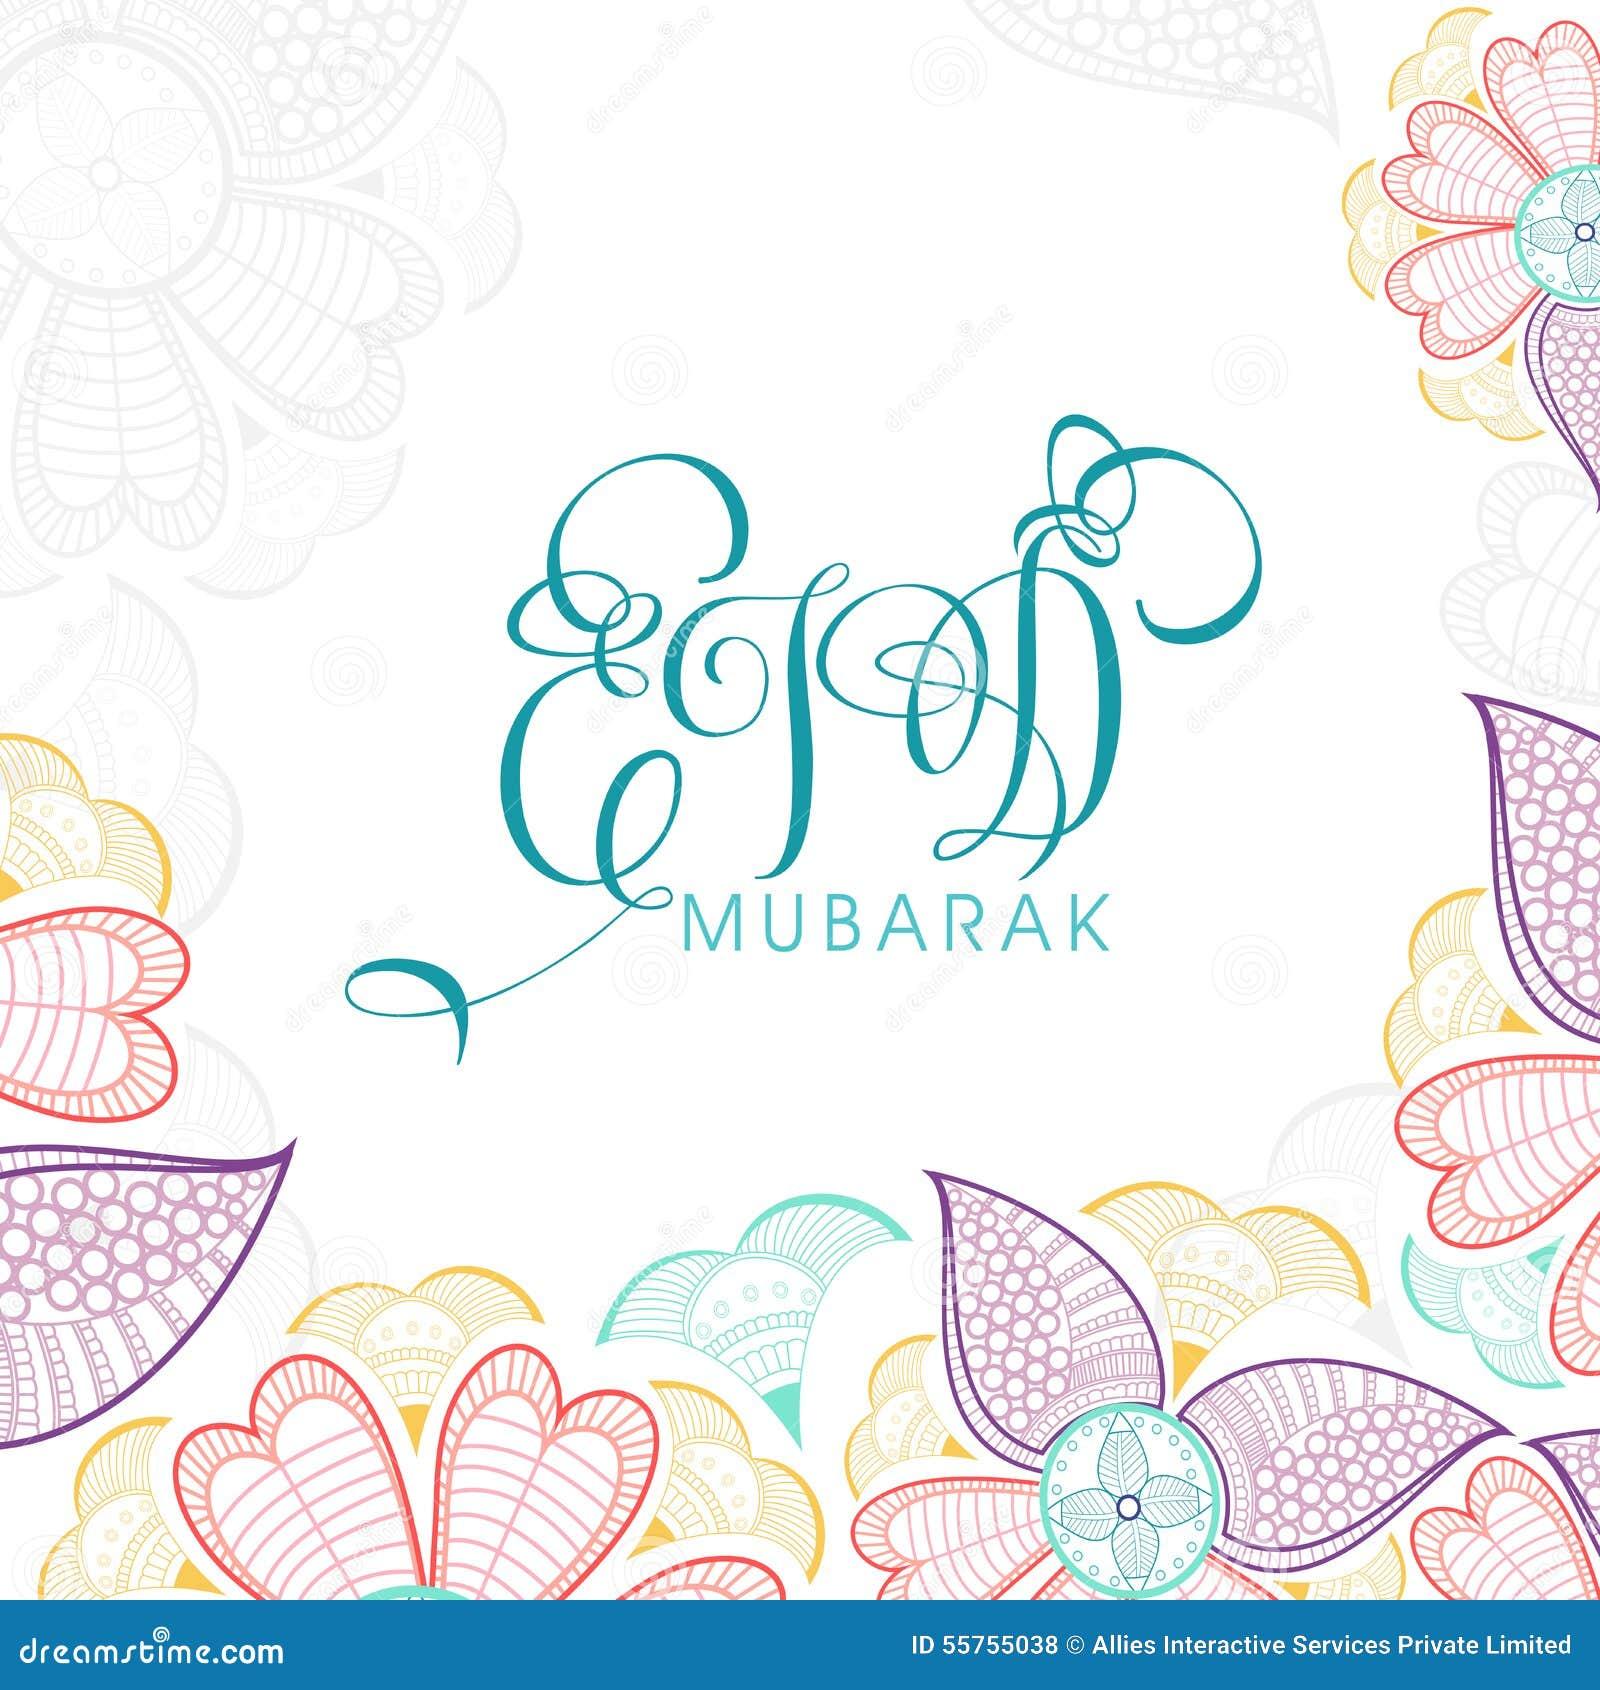 Floral Greeting Card For Eid Mubarak Celebration Stock Illustration